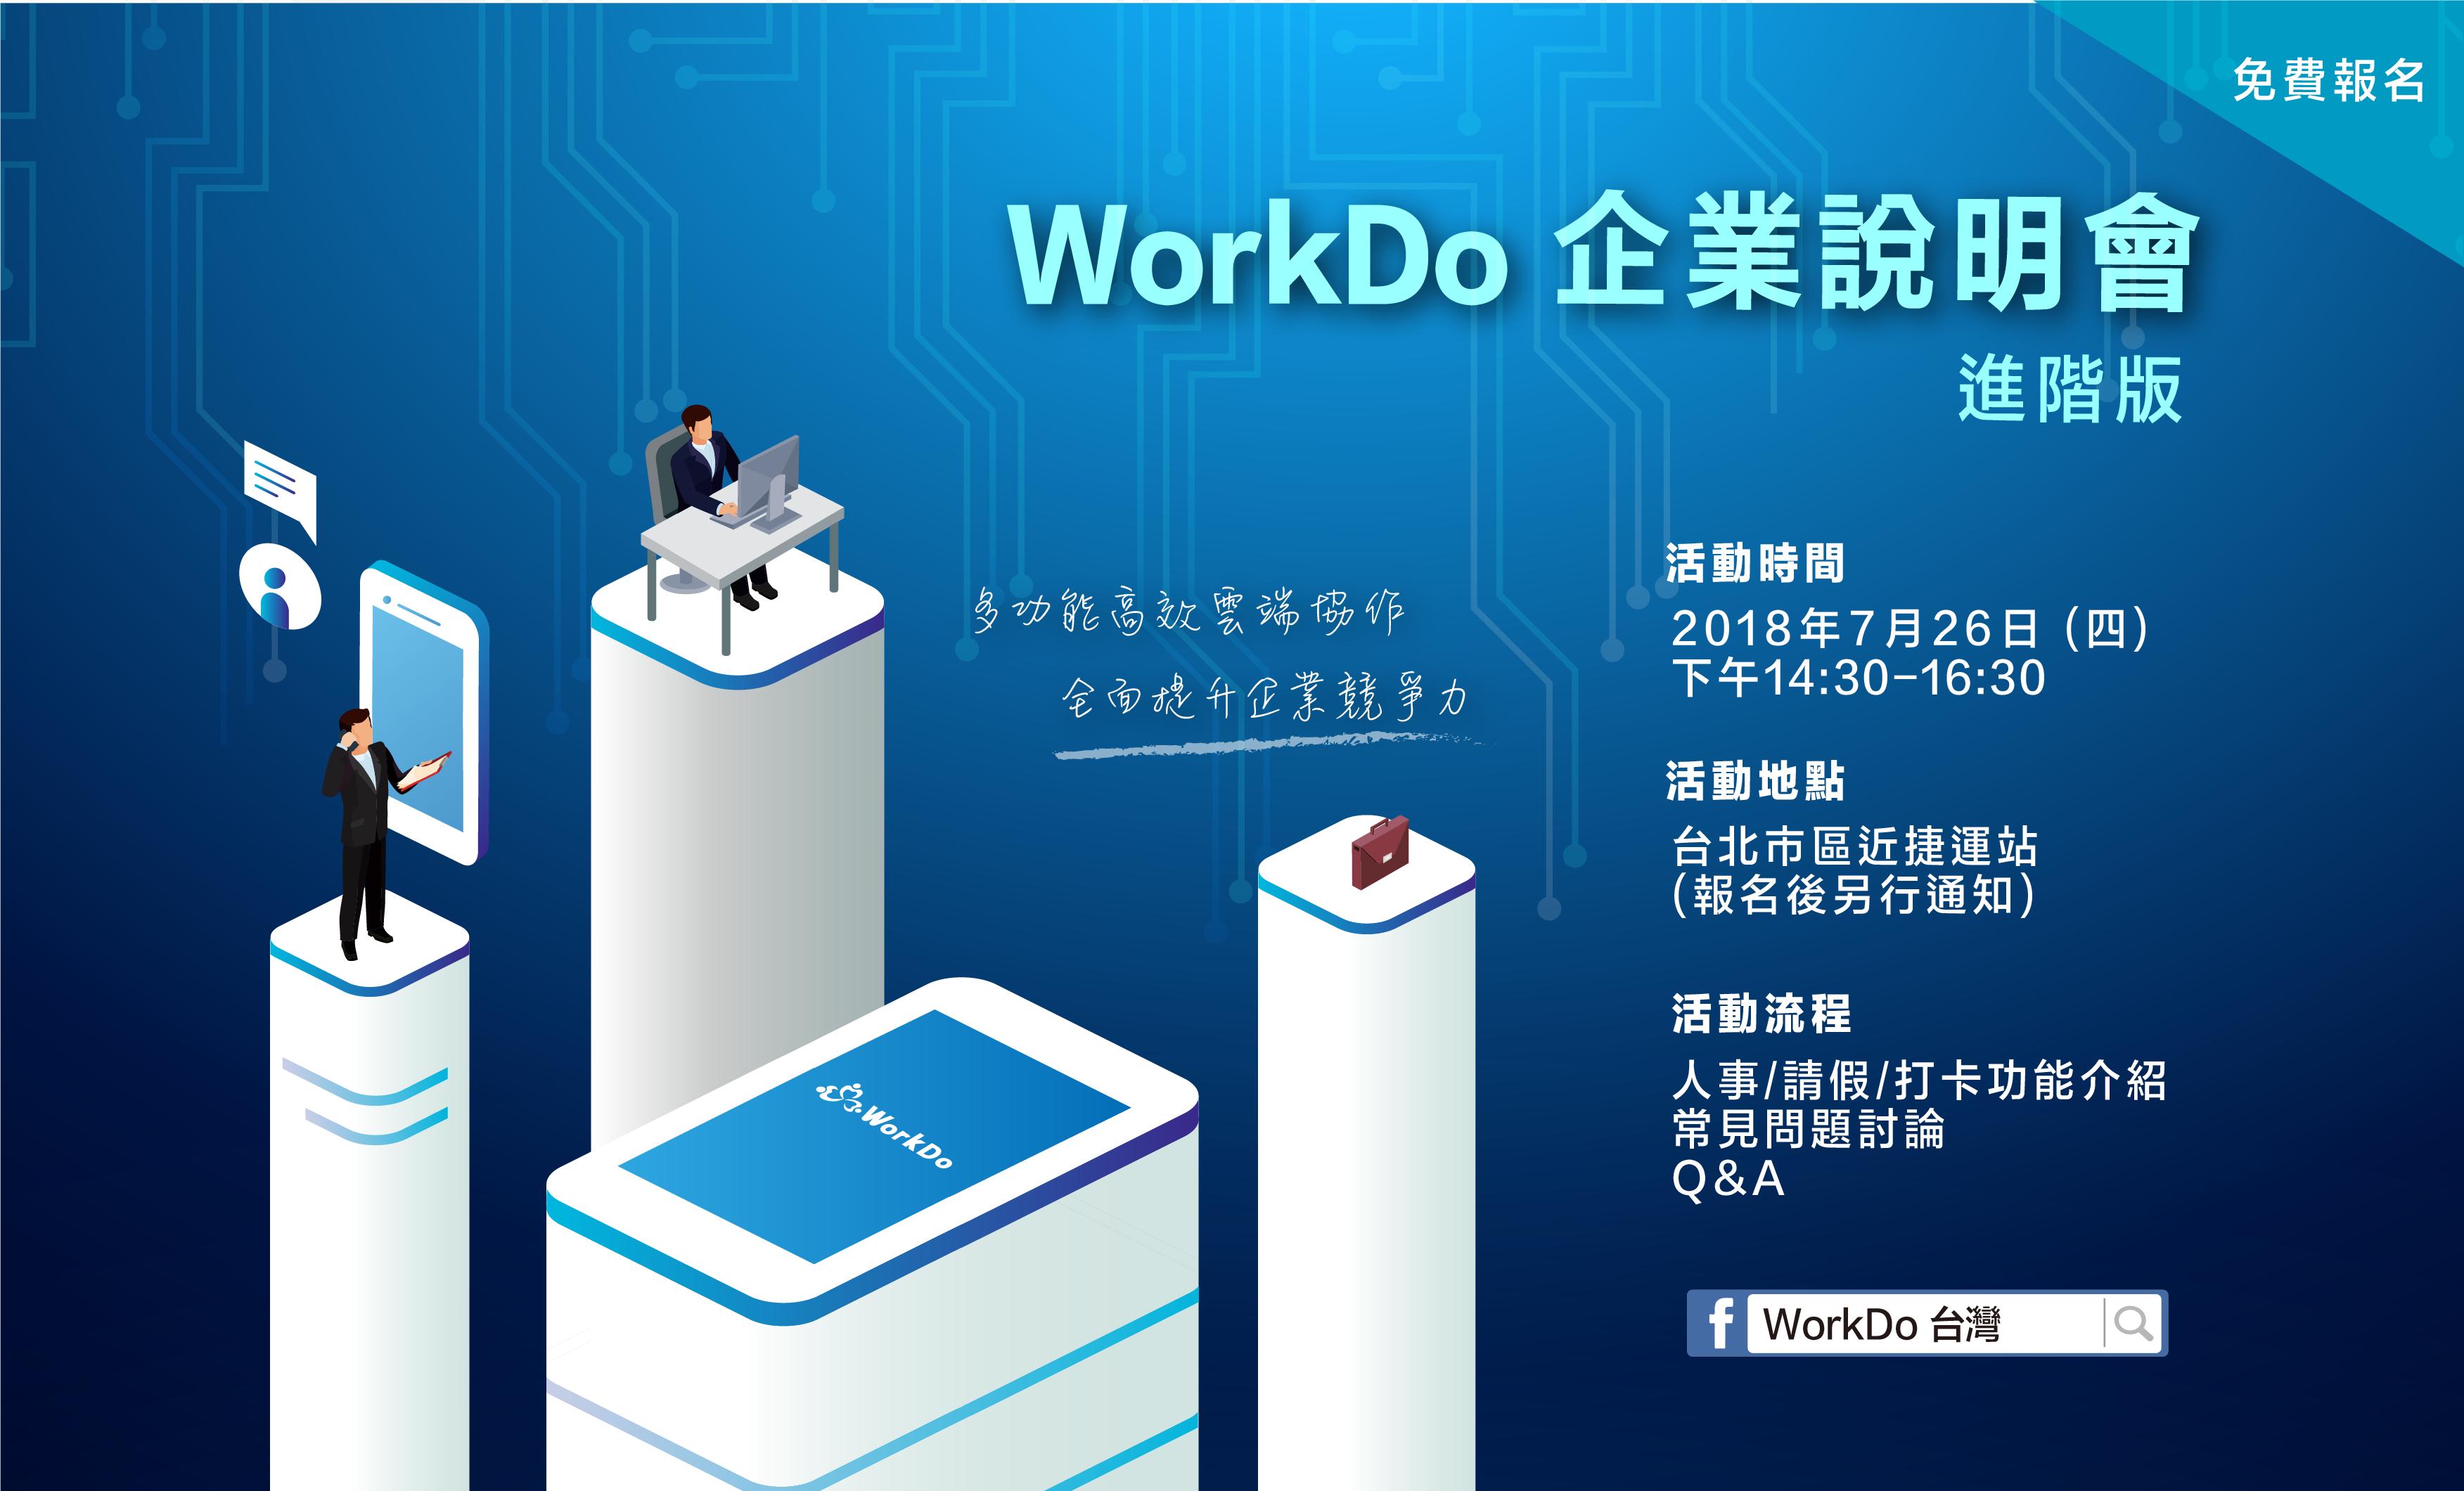 WorkDo說明會